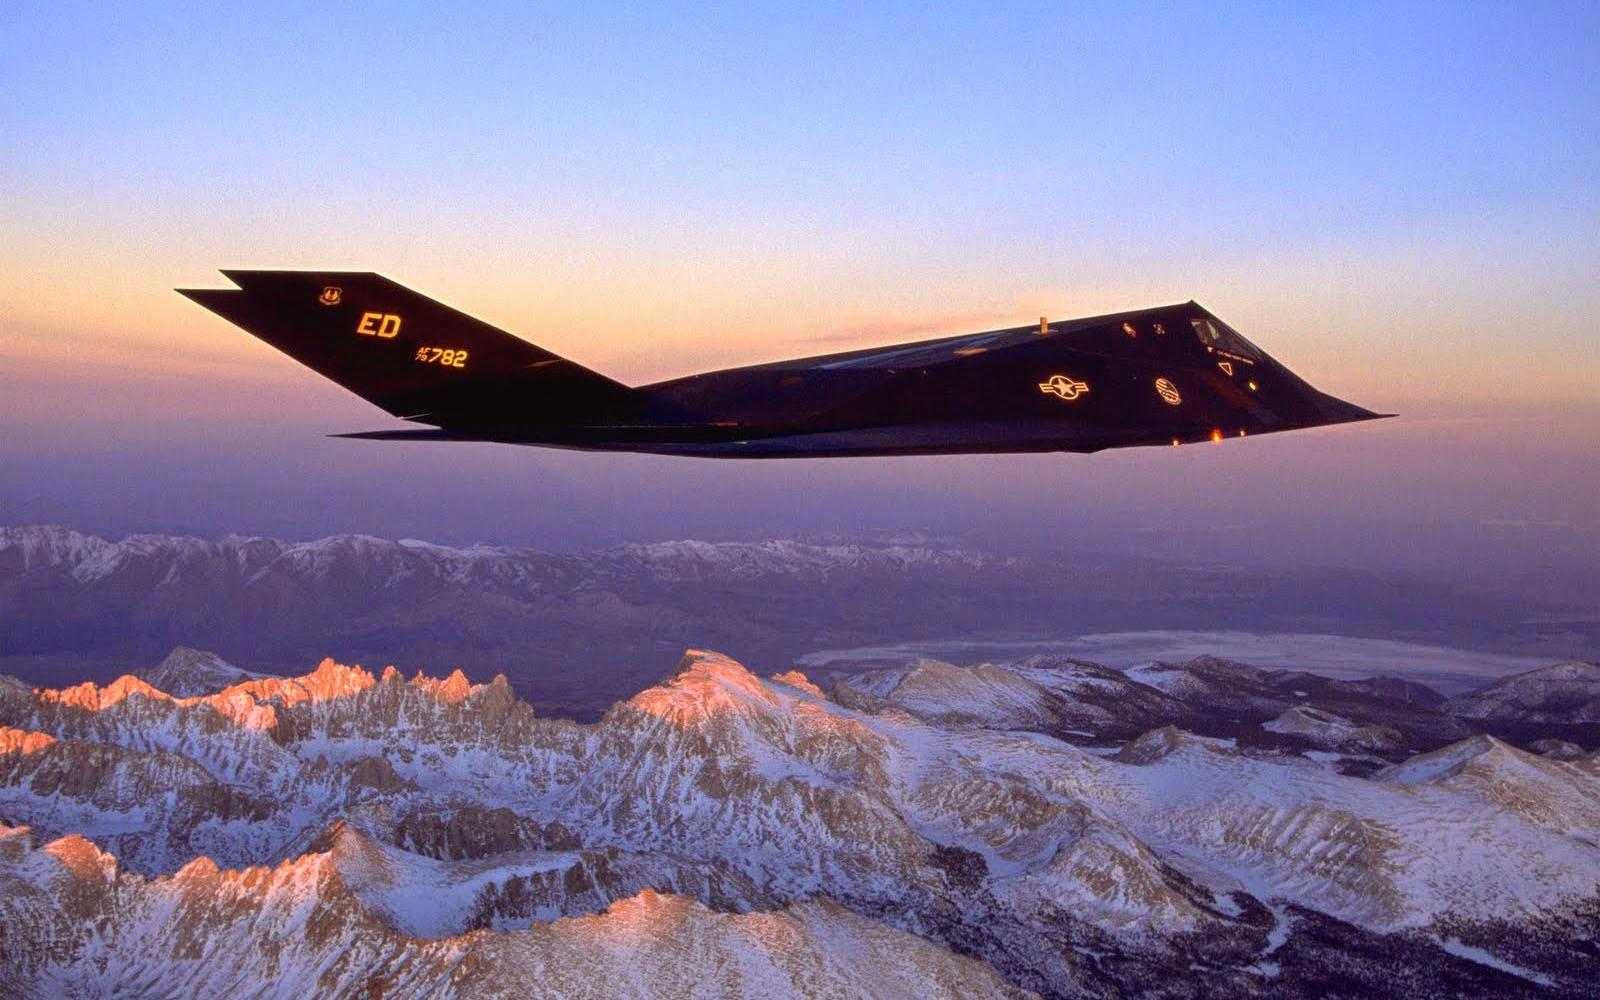 wallpapers: Lockheed F-117 Nighthawk Aircraft Wallpapers